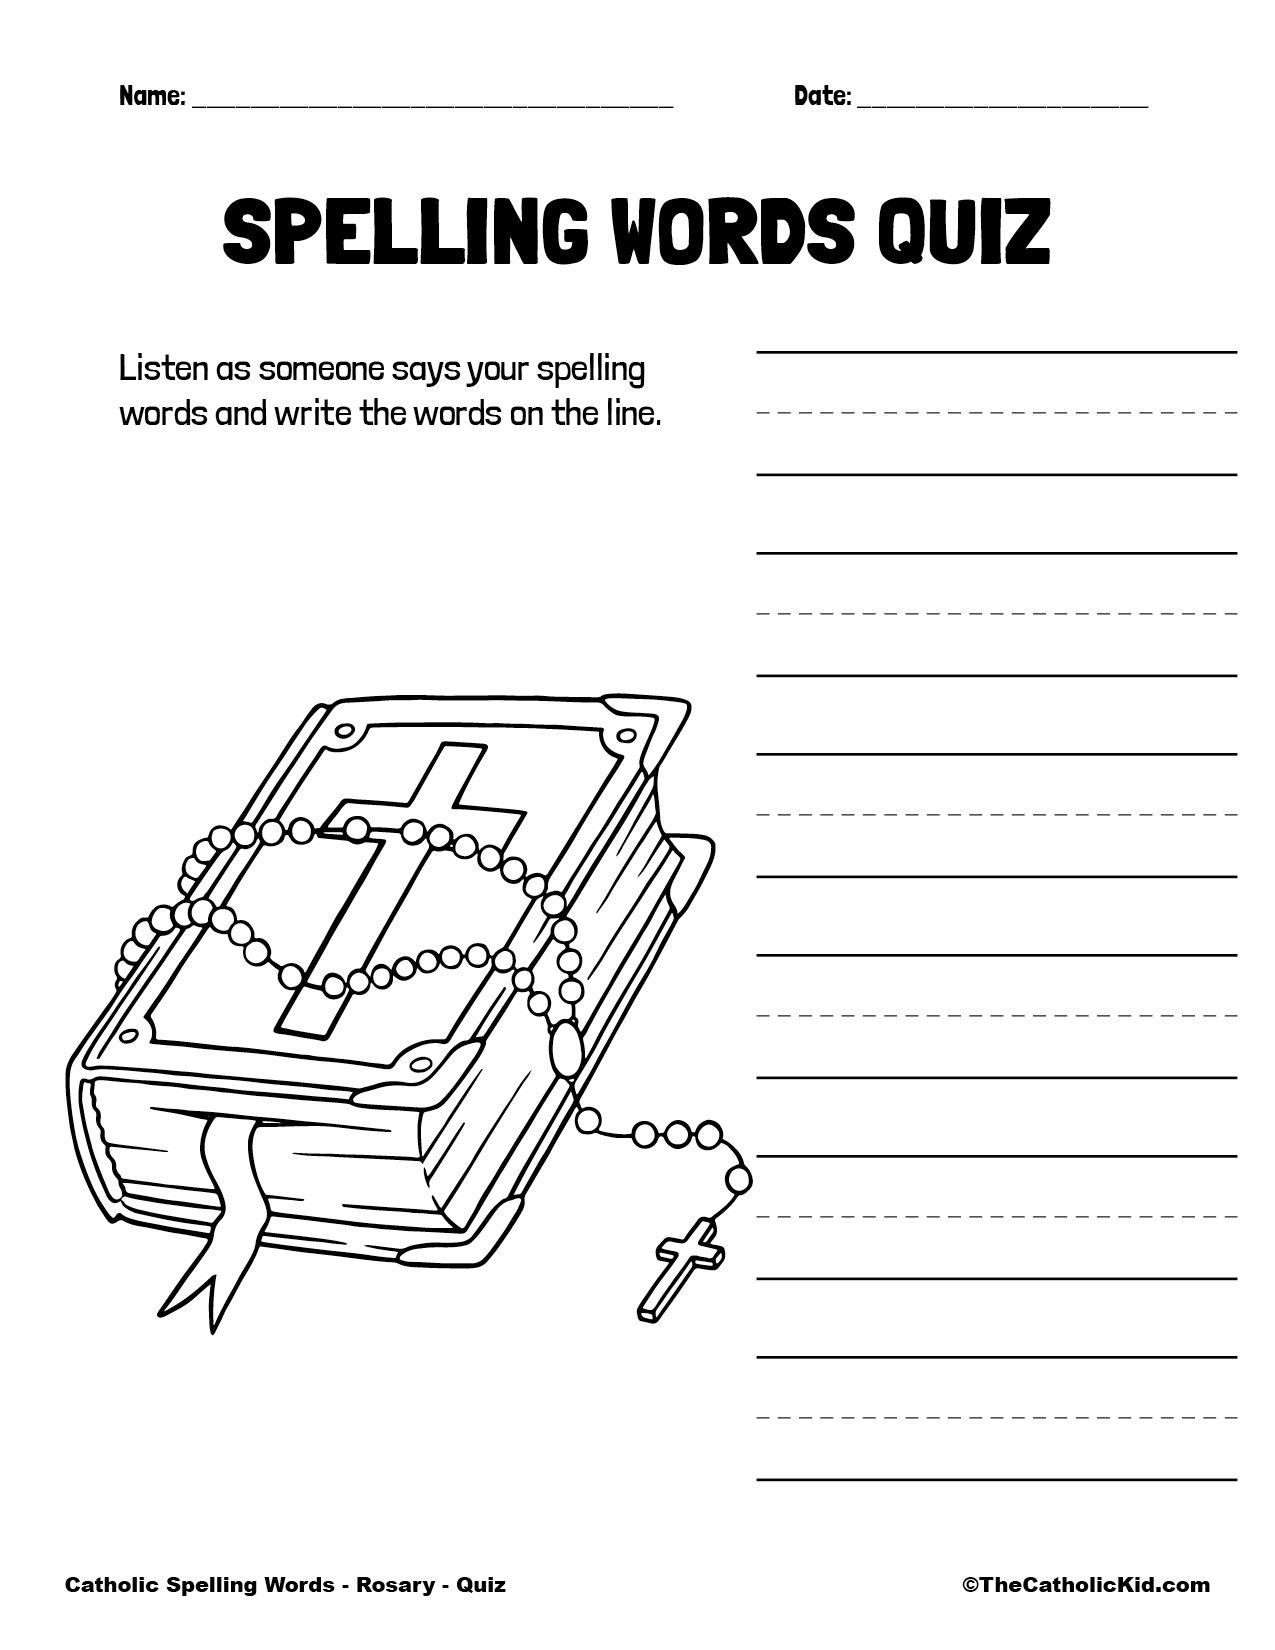 Catholic Spelling & Vocabulary Words Rosary Worksheet 5 Quiz